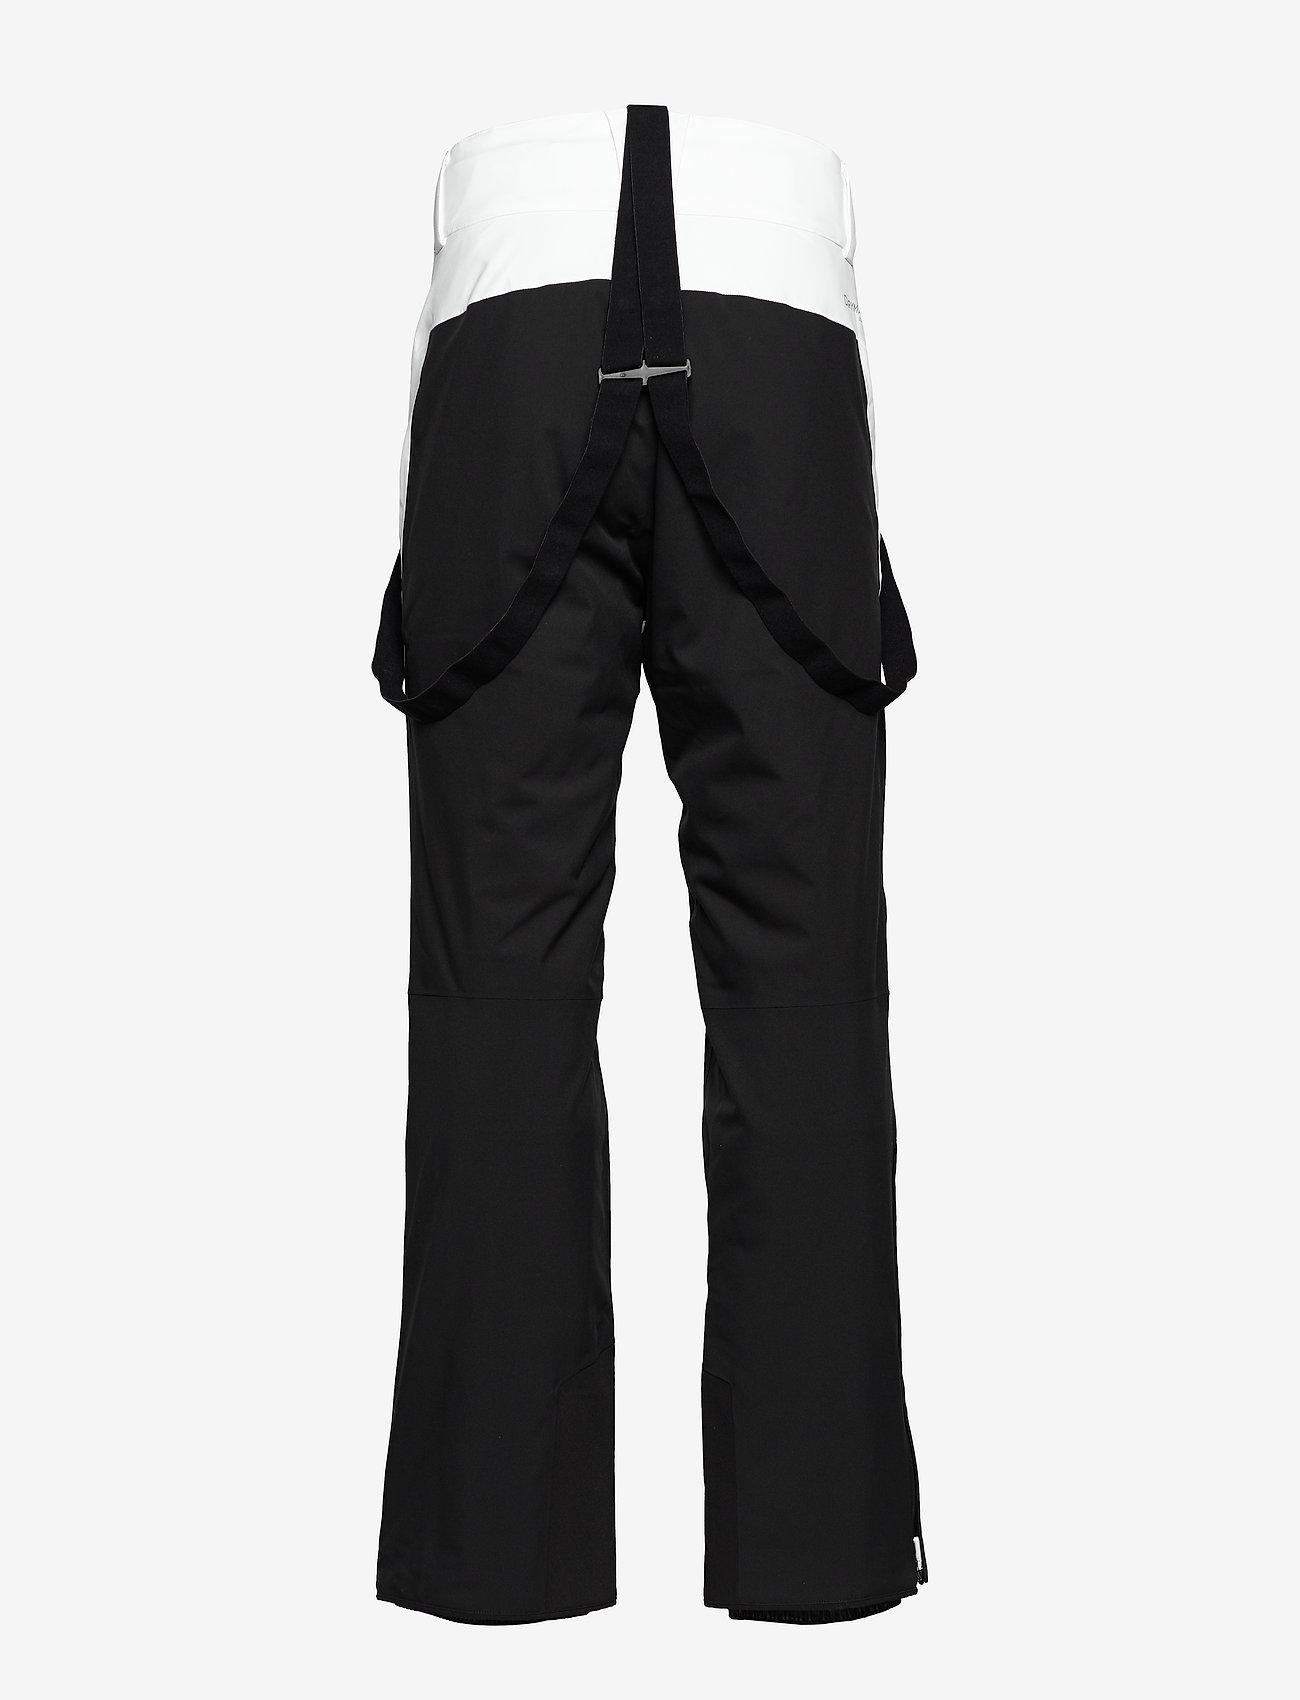 Halti - Podium II M Pants - insulated pantsinsulated pants - white - 1